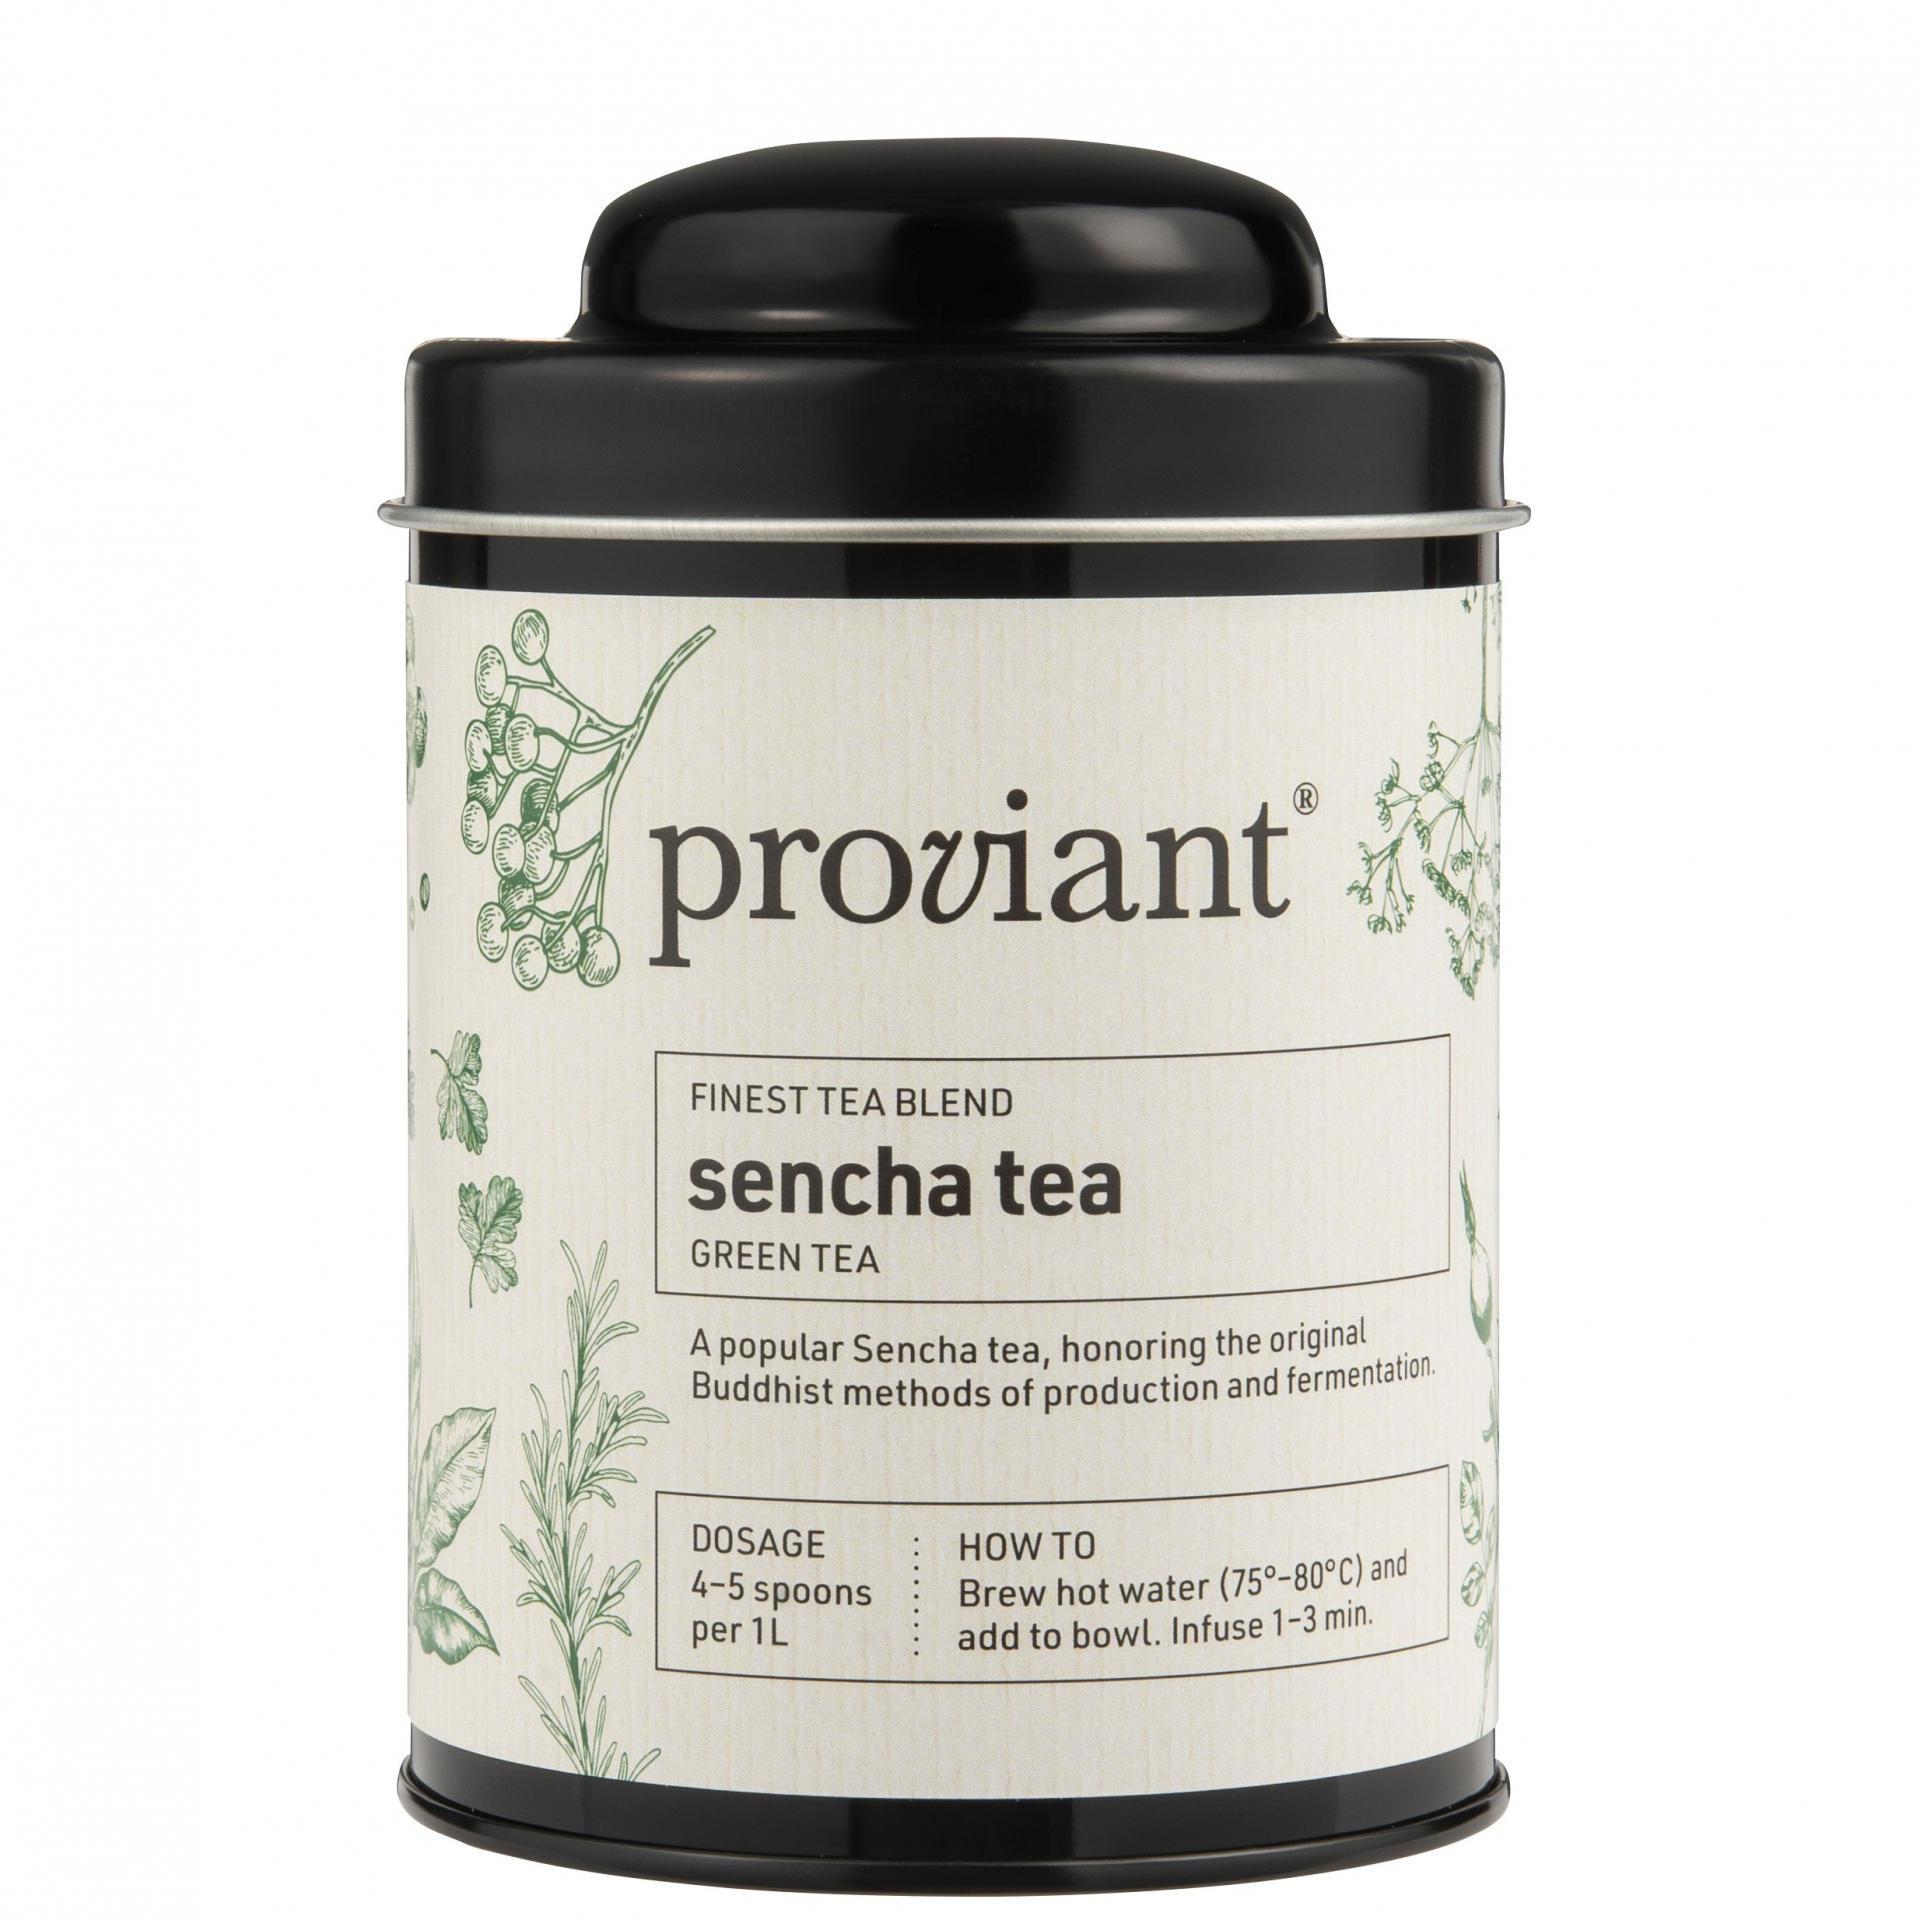 Proviant Zelený čaj Sencha v dóze 100 g, zelená barva, černá barva, kov